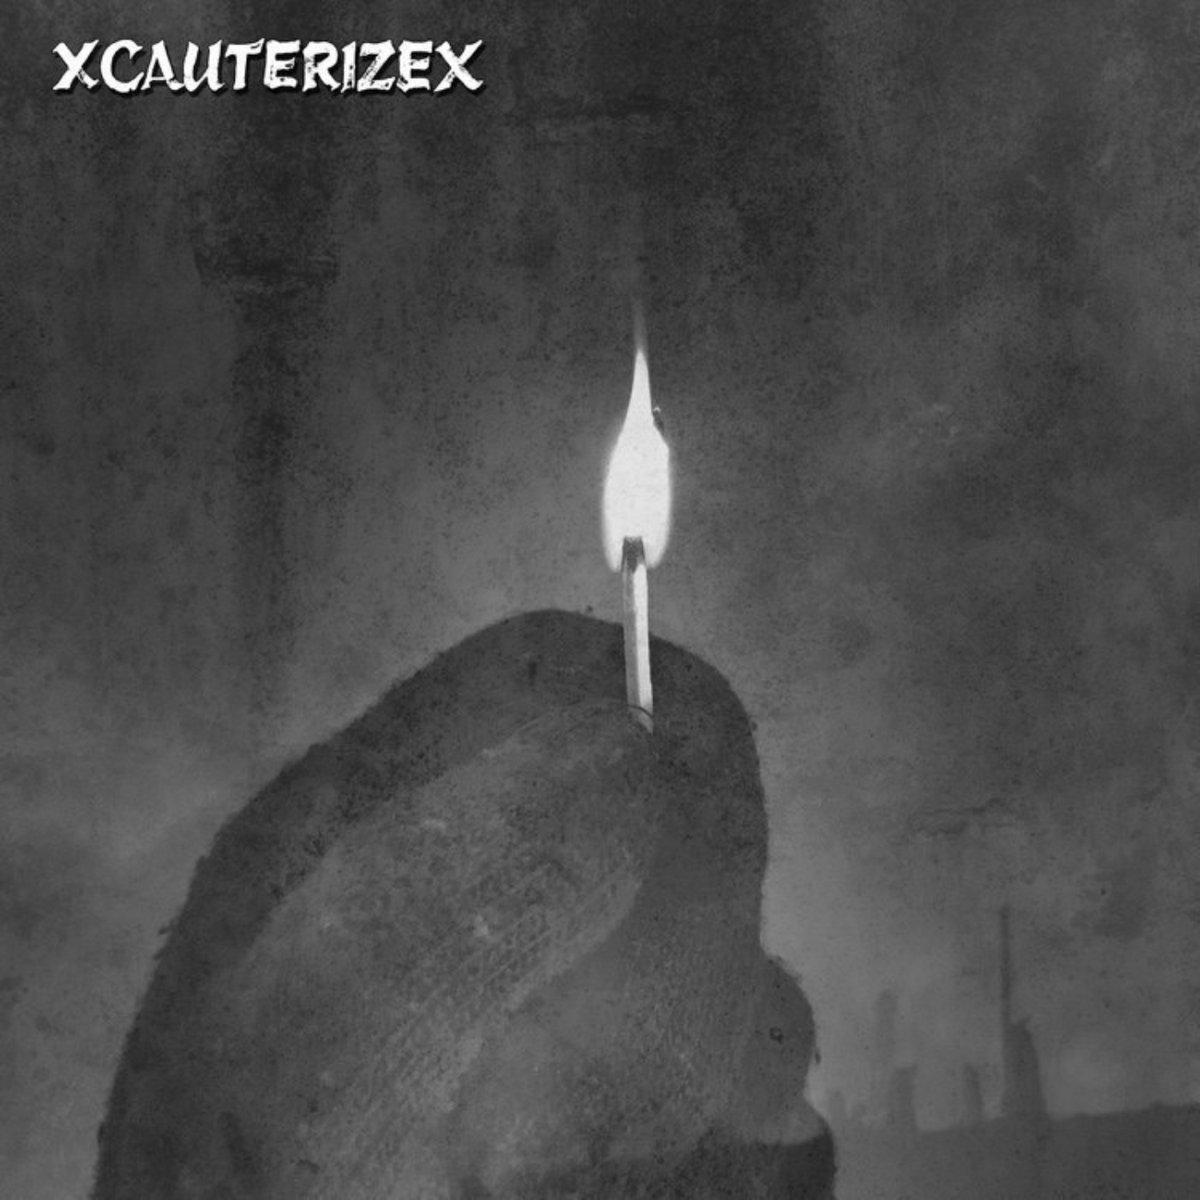 xCauterizex - Blessed flame CS